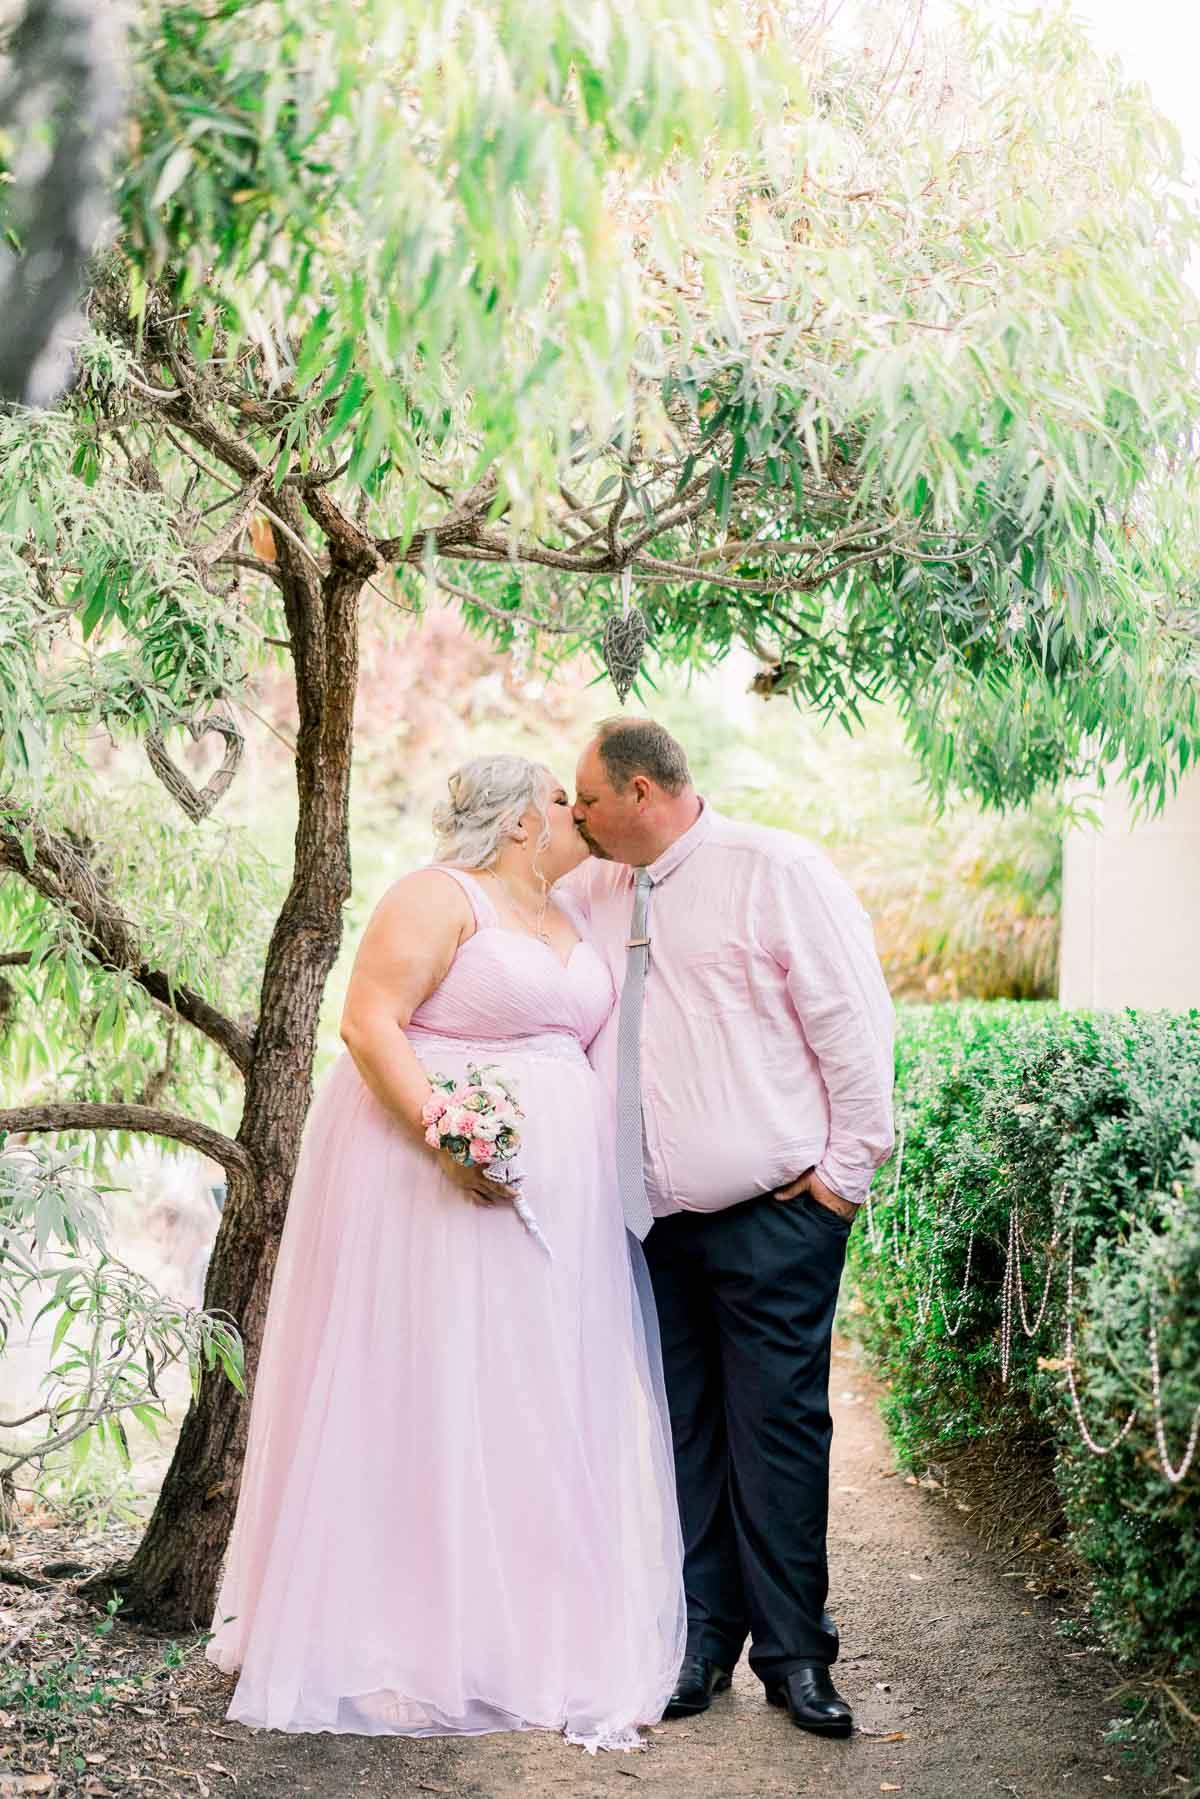 mt-eliza-mornington-peninsula-backyard-wedding-heart+soul-weddings-allison-matt-04032.jpg